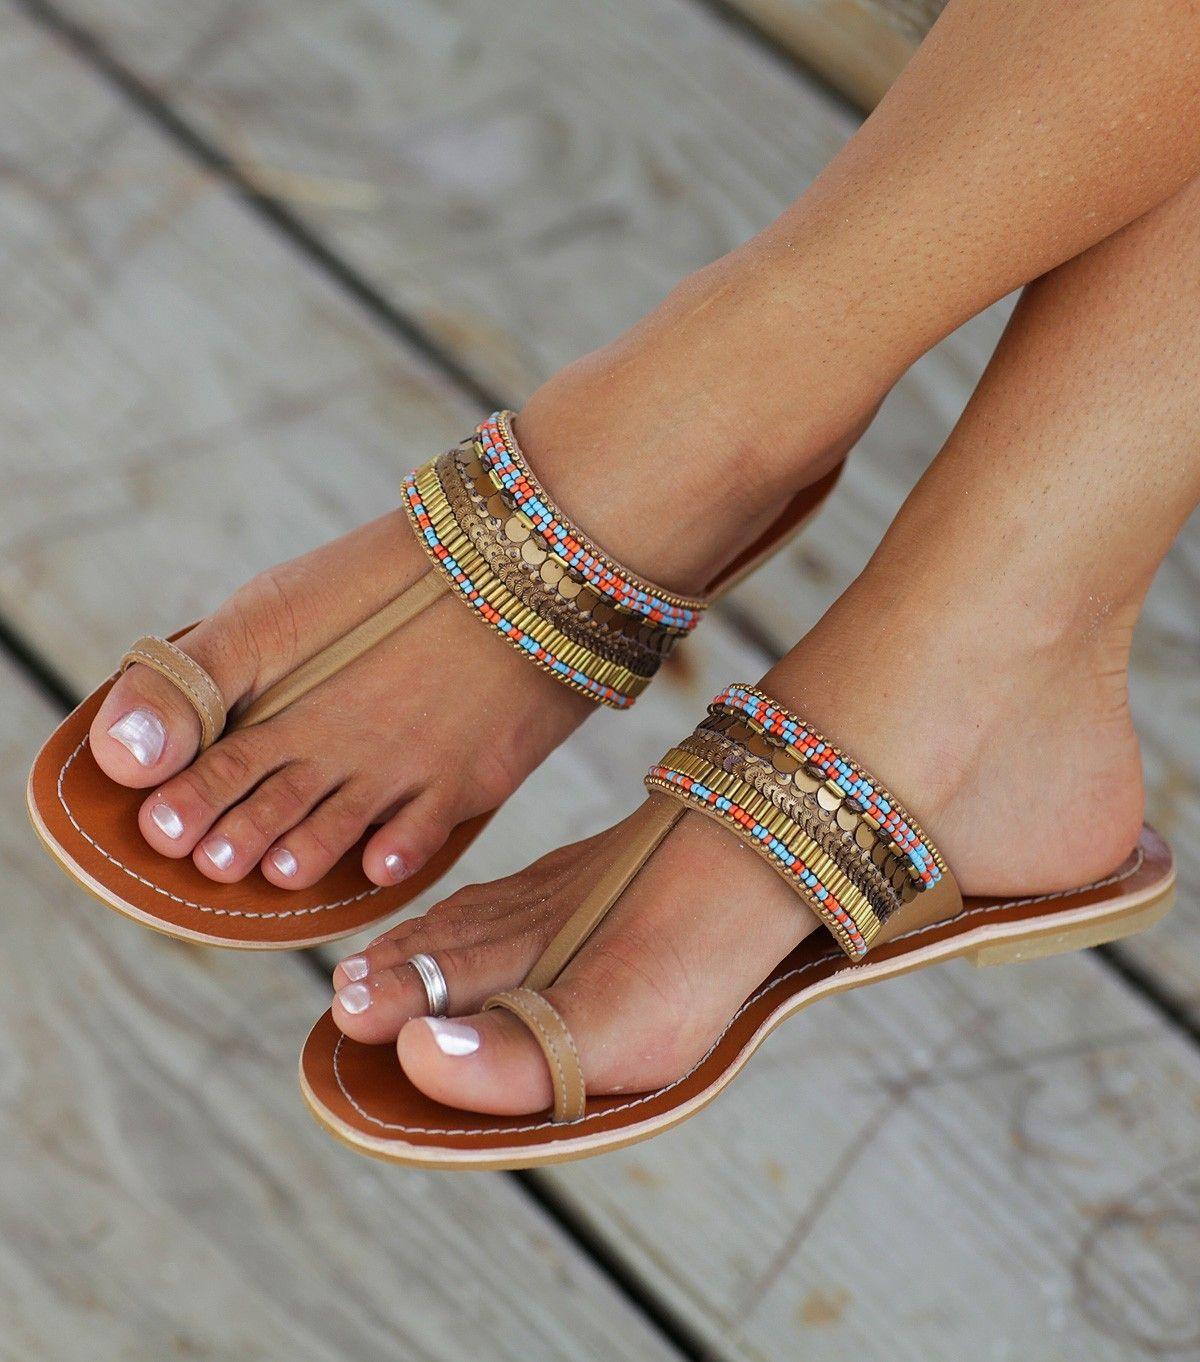 Jamaican sandals shoes - Zapatos De Mujer Womens Shoes Sandals